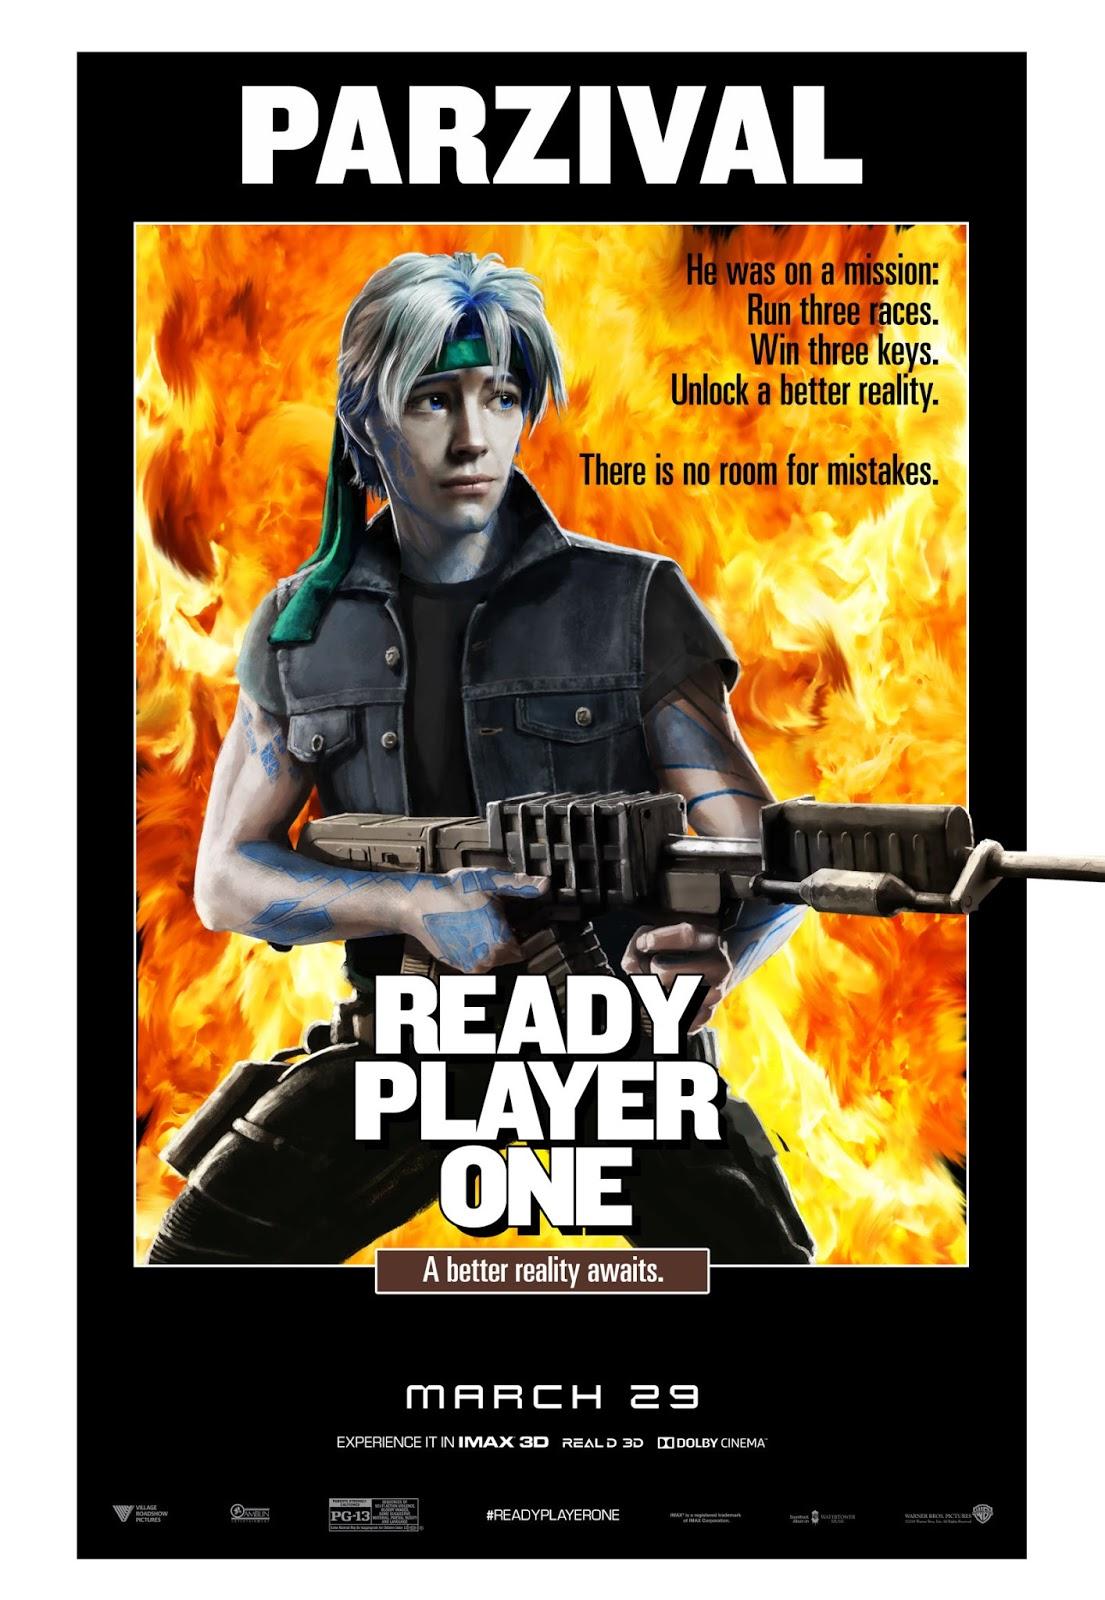 Первому игроку приготовиться, Ready Player One, Фантастика, SciFi, Киберпанк, Cyberpunk, Постер, Постеры, Poster, Posters